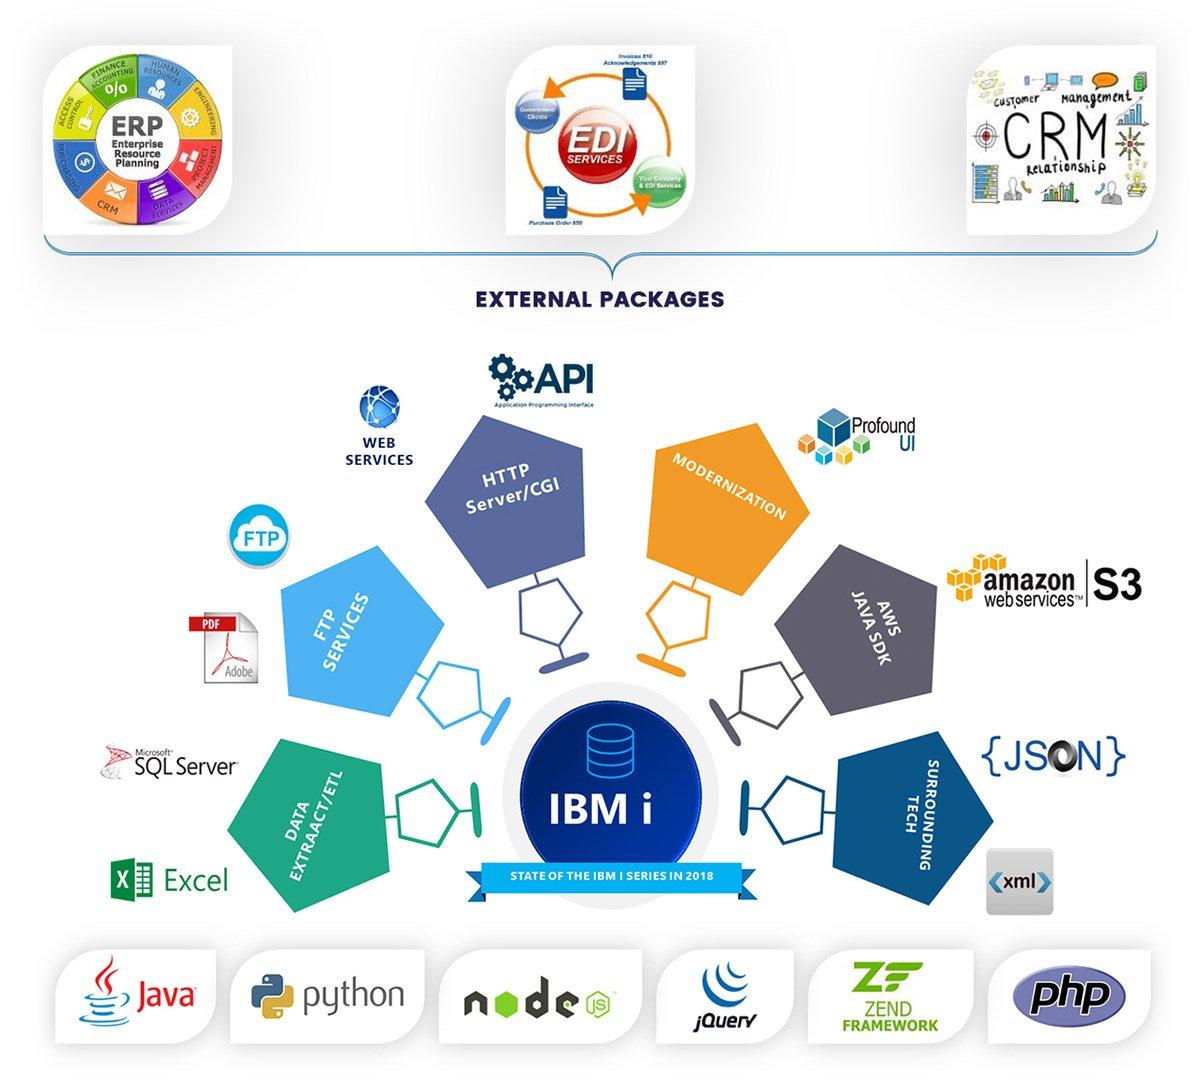 IBM i Interaction